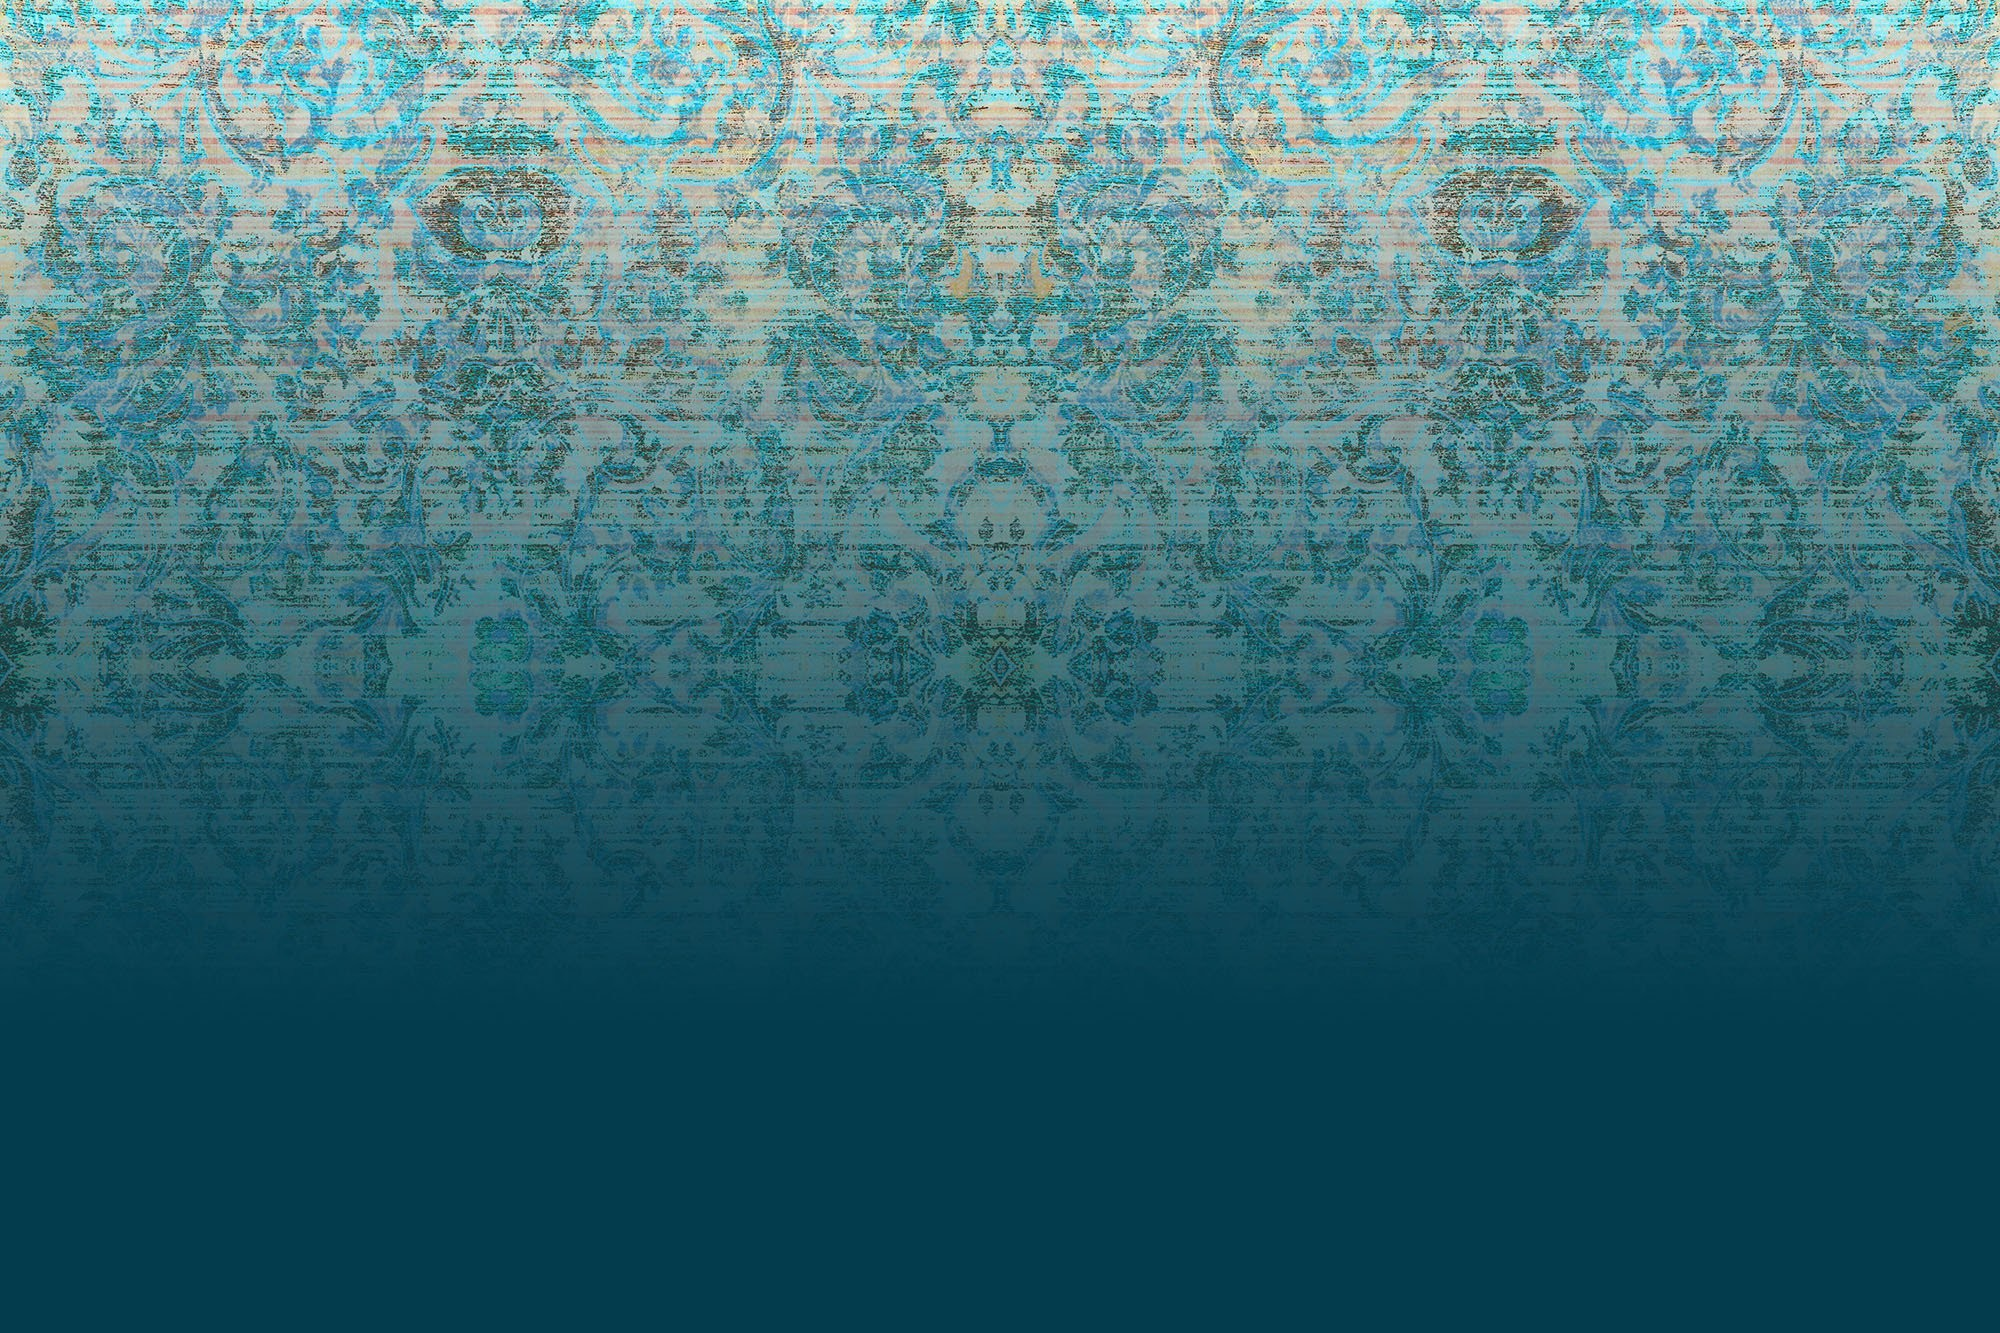 Chapelle Blue Blush Wallpaper